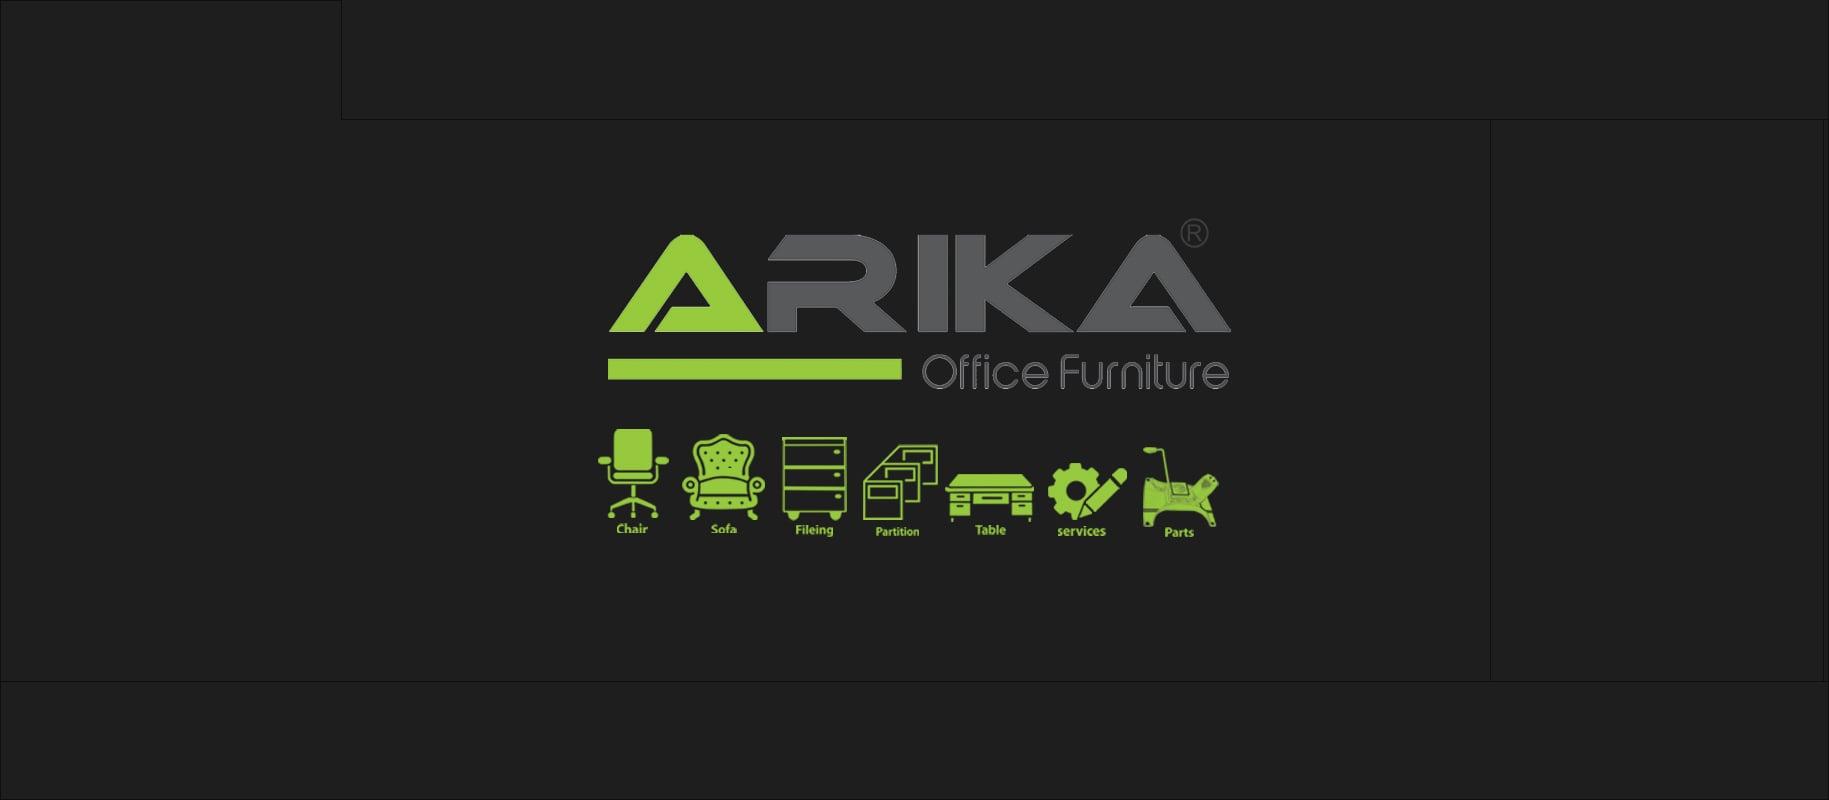 arika office furniture